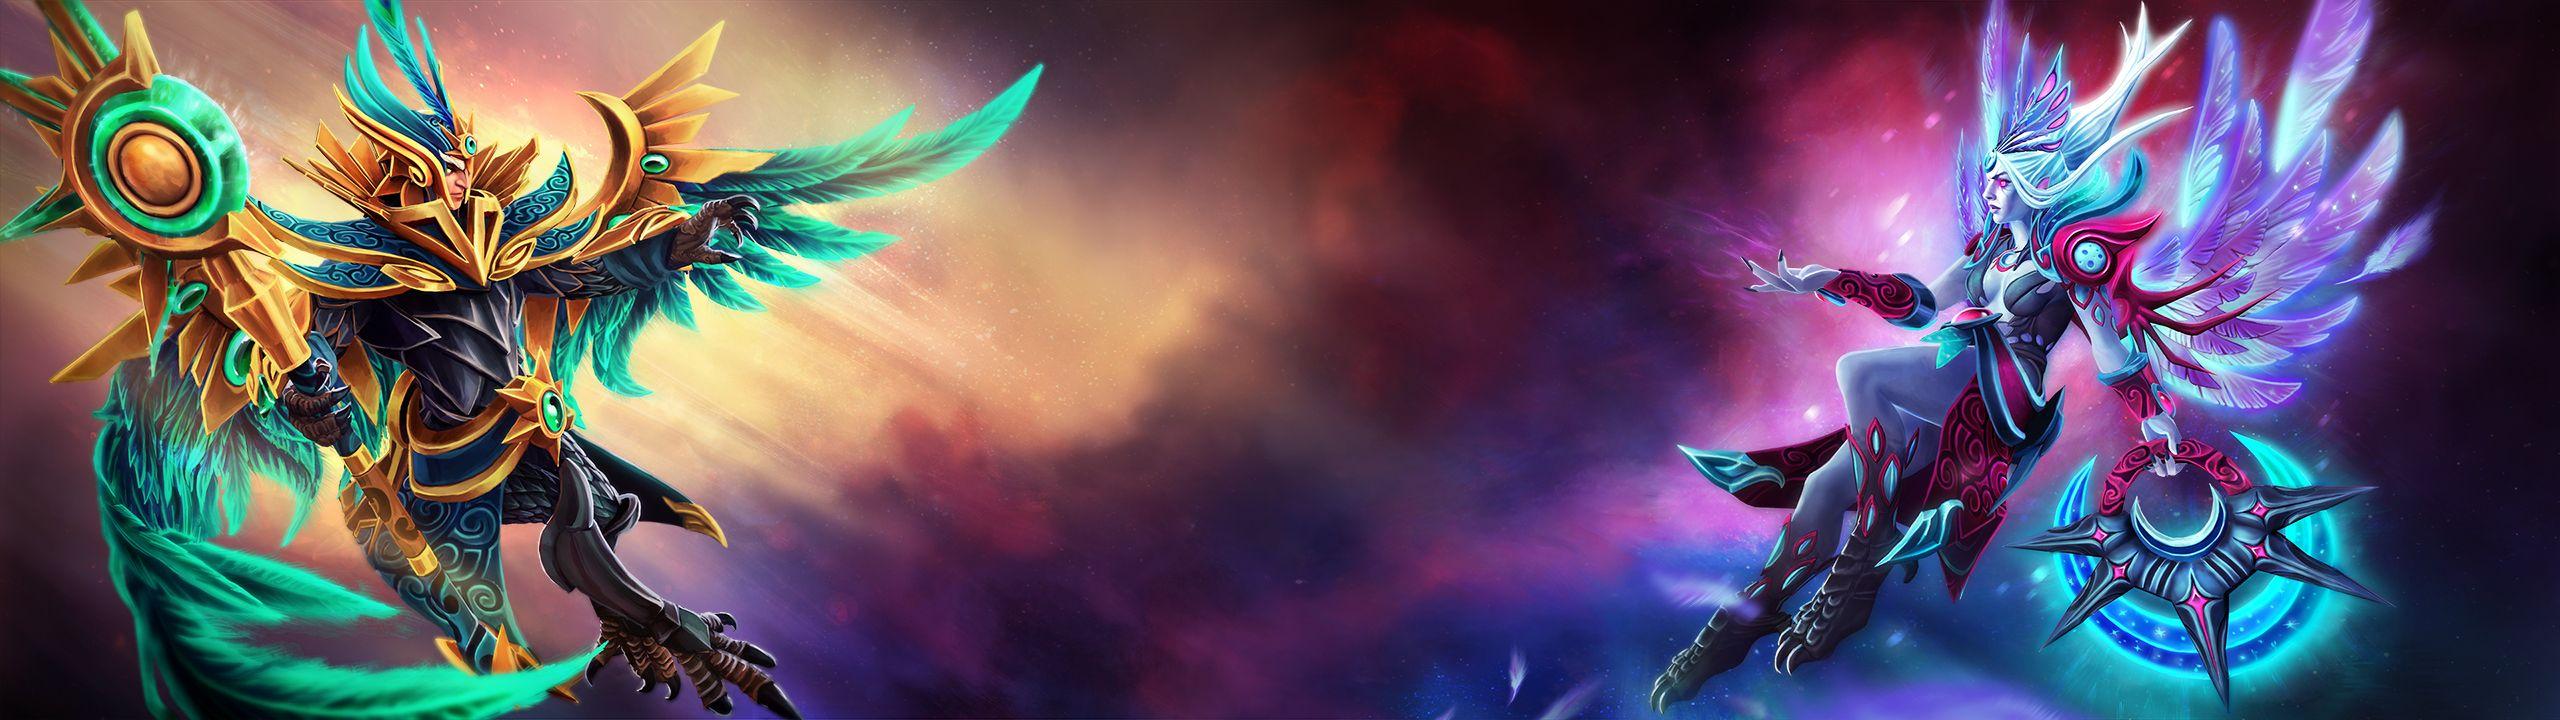 Vengeful Spirit and Skywrath Mage Wallpaper, more http